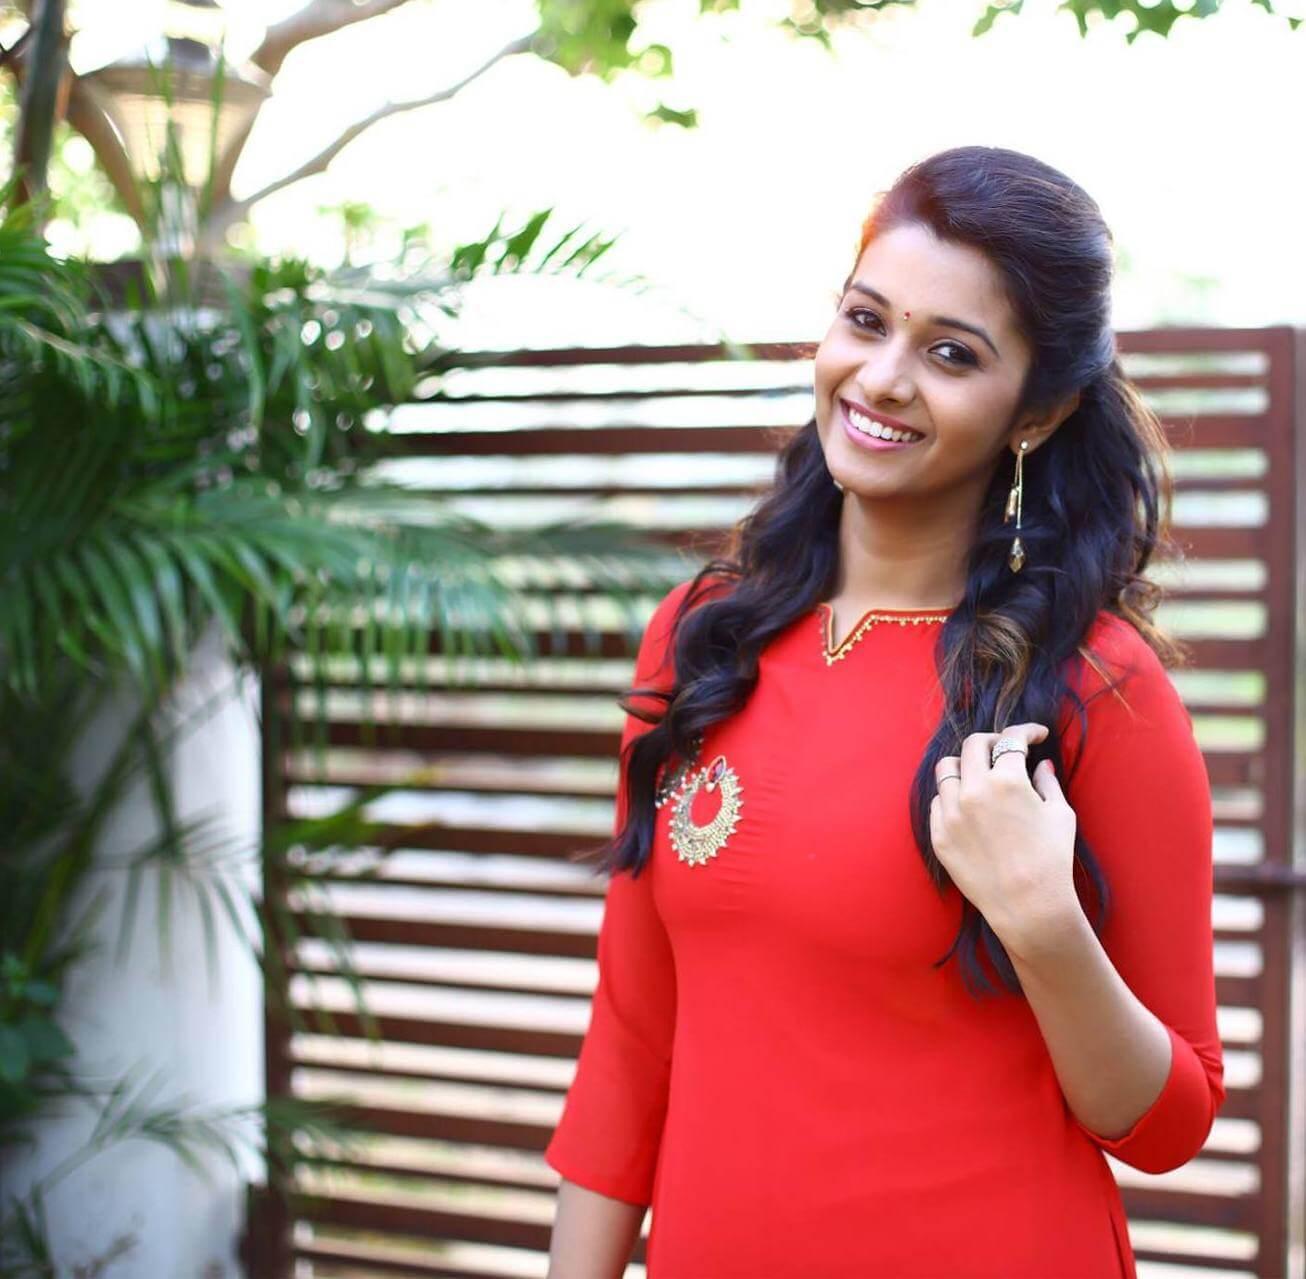 Kollywood Actress Priya Bhavani Shankar Latest Hd Photos: Priya Bhavani Shankar Images